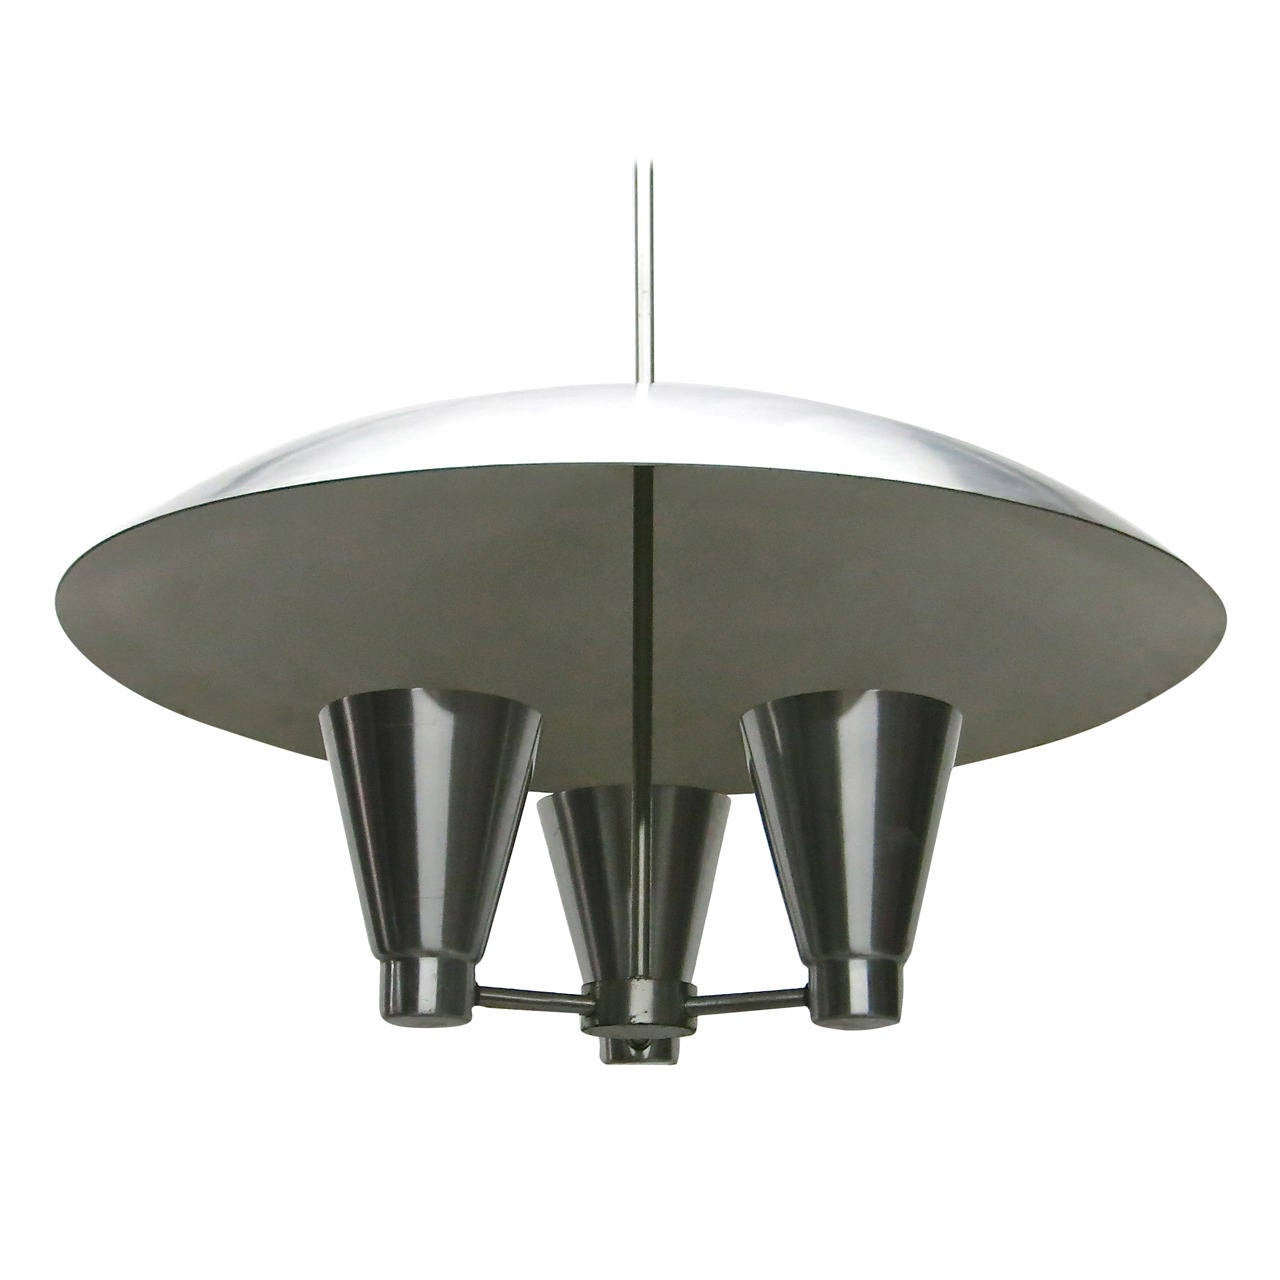 Ceiling light fixture in spun aluminum by edward wormley usa ceiling light fixture in spun aluminum by edward wormley usa 1950s 1 arubaitofo Image collections